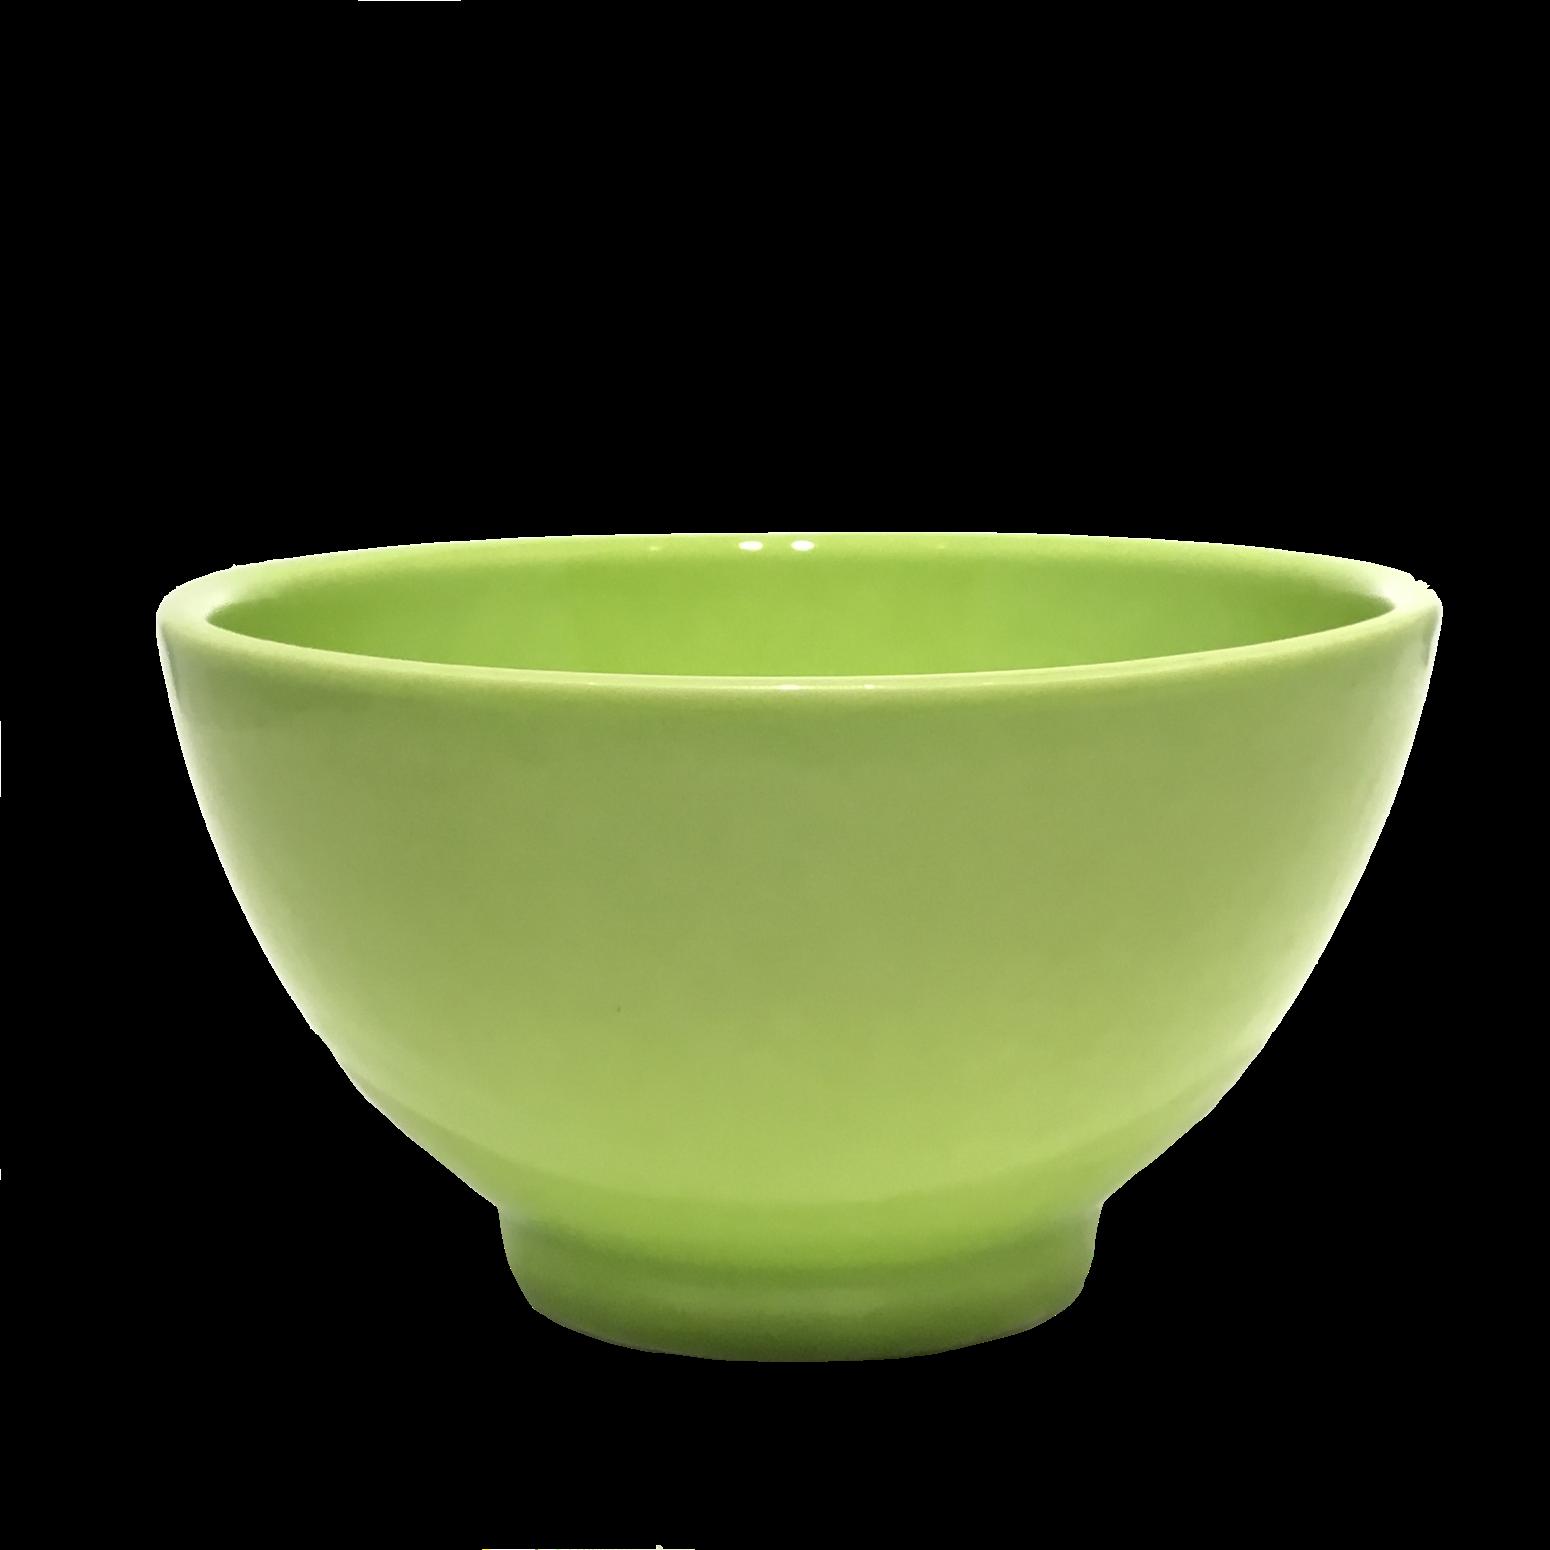 Bowl Coupe-2